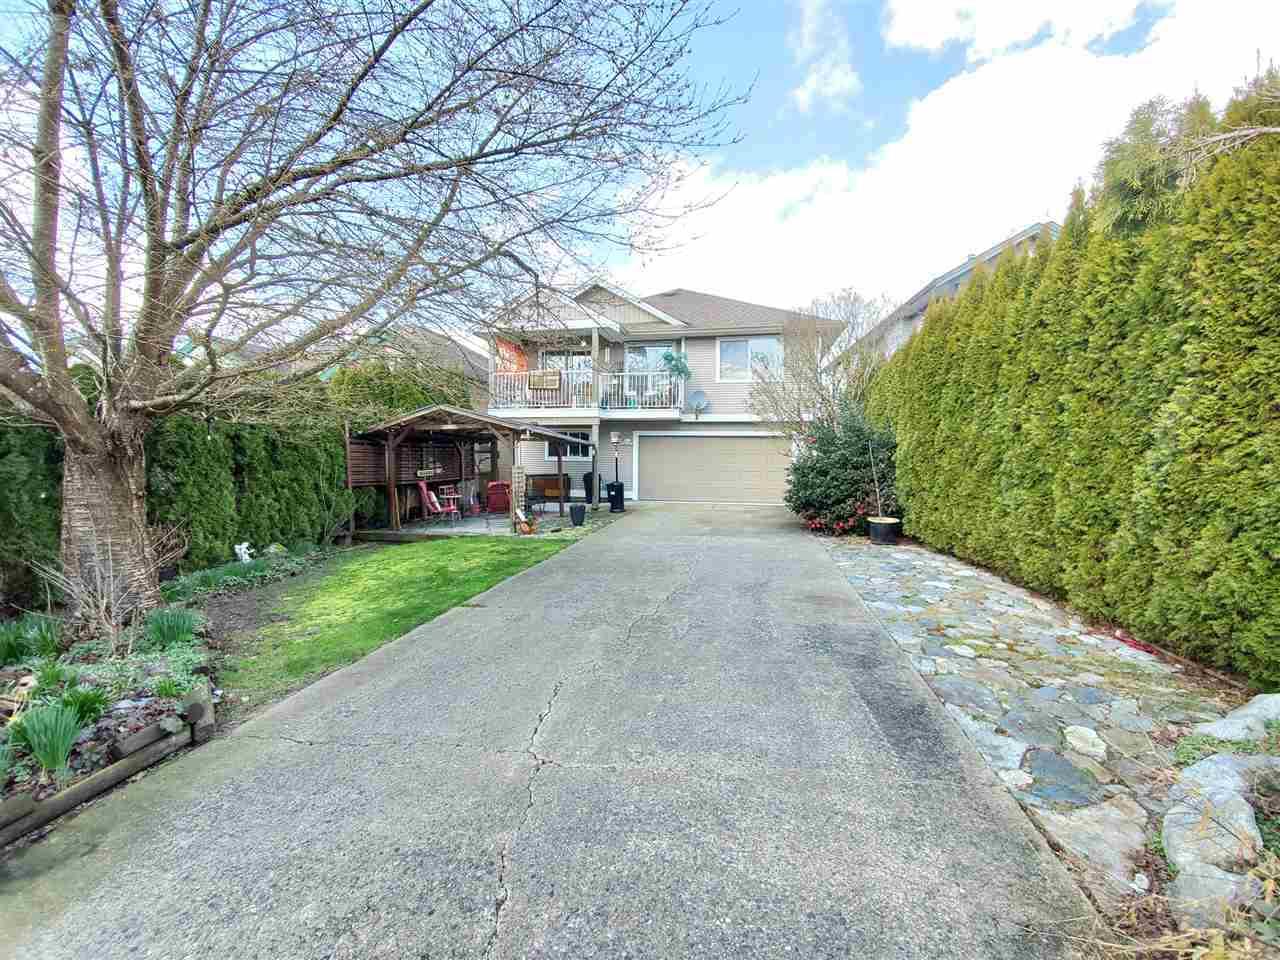 23748-kanaka-way-cottonwood-mr-maple-ridge-20 at 23748 Kanaka Way, Cottonwood MR, Maple Ridge